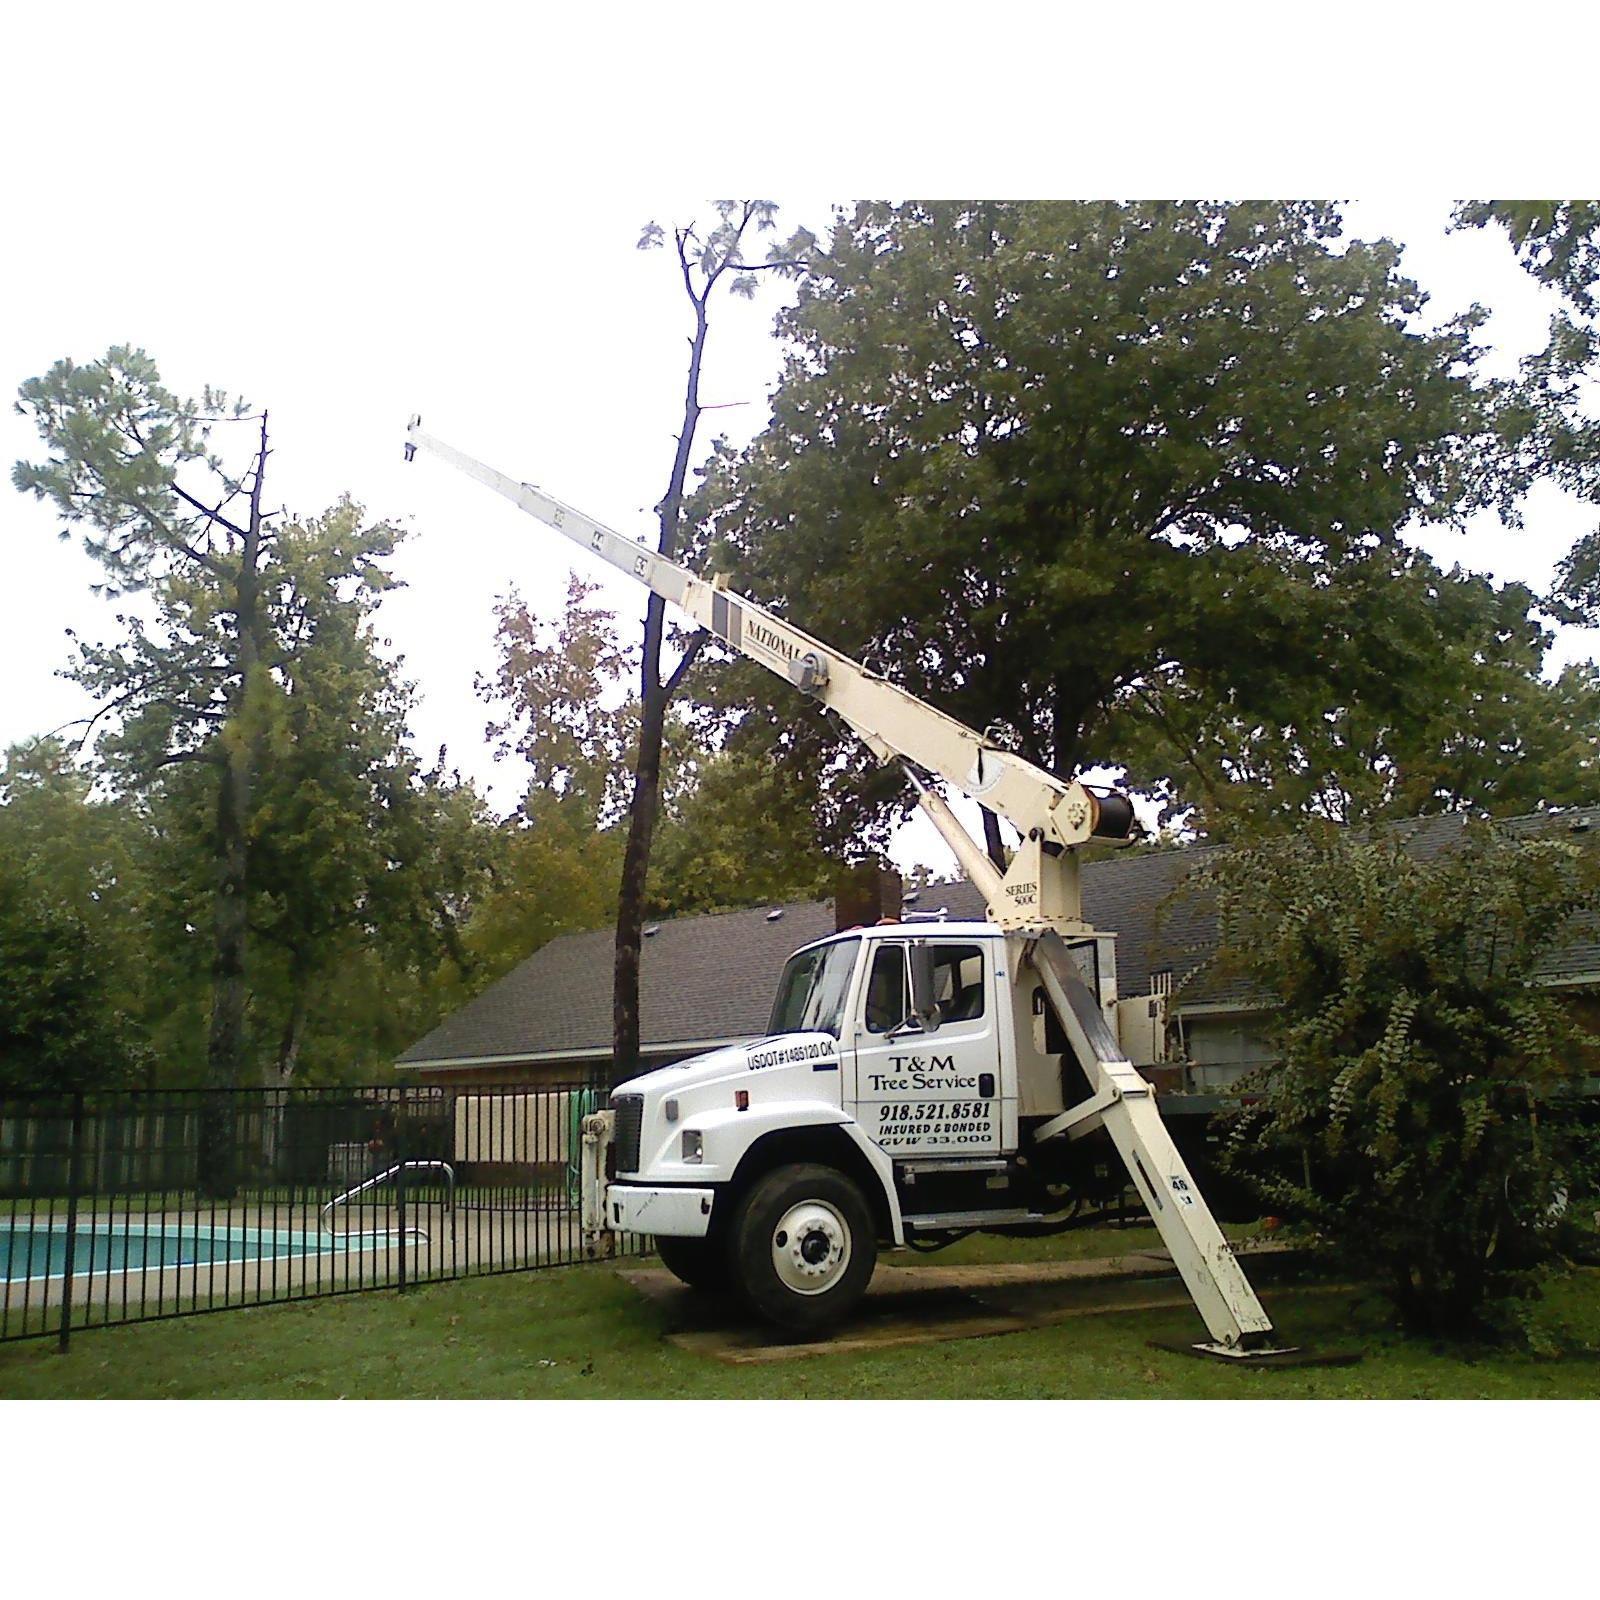 T & M Tree Service image 5